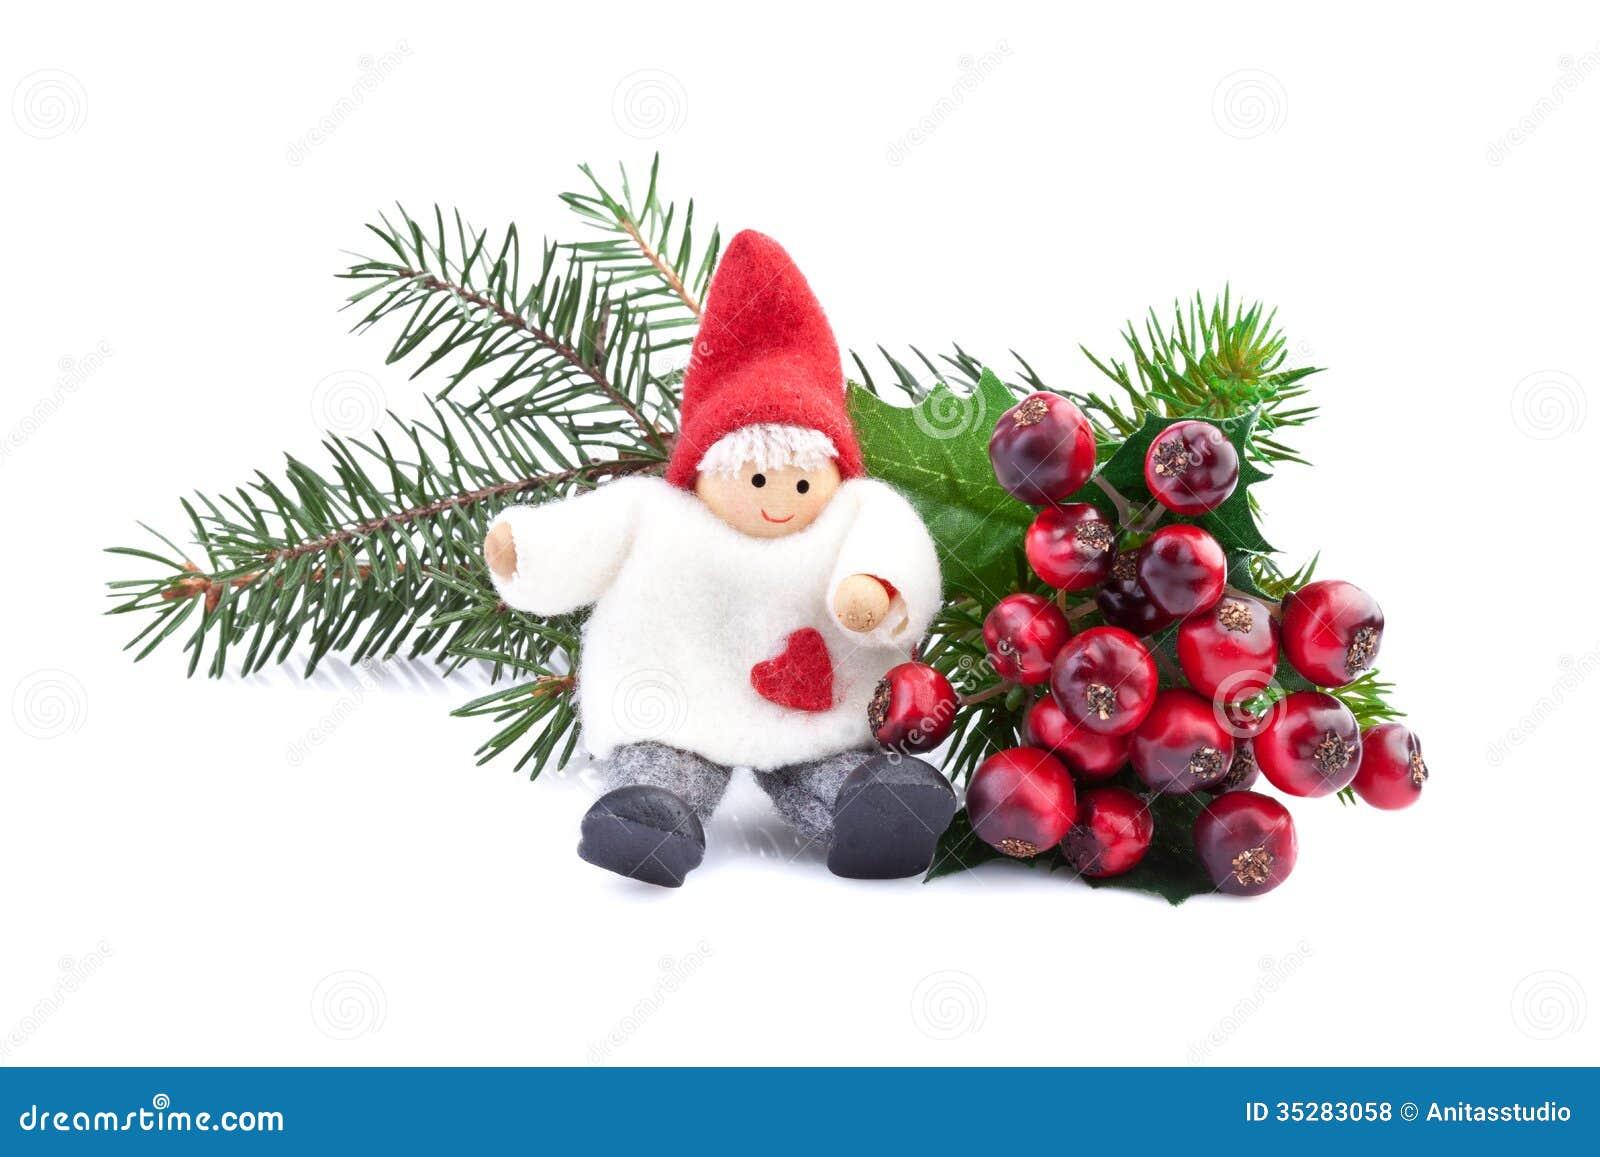 #B01B2F Christmas Decoration On White Royalty Free Stock Photos  6411 décoration noel fabriquer cm1 1300x957 px @ aertt.com